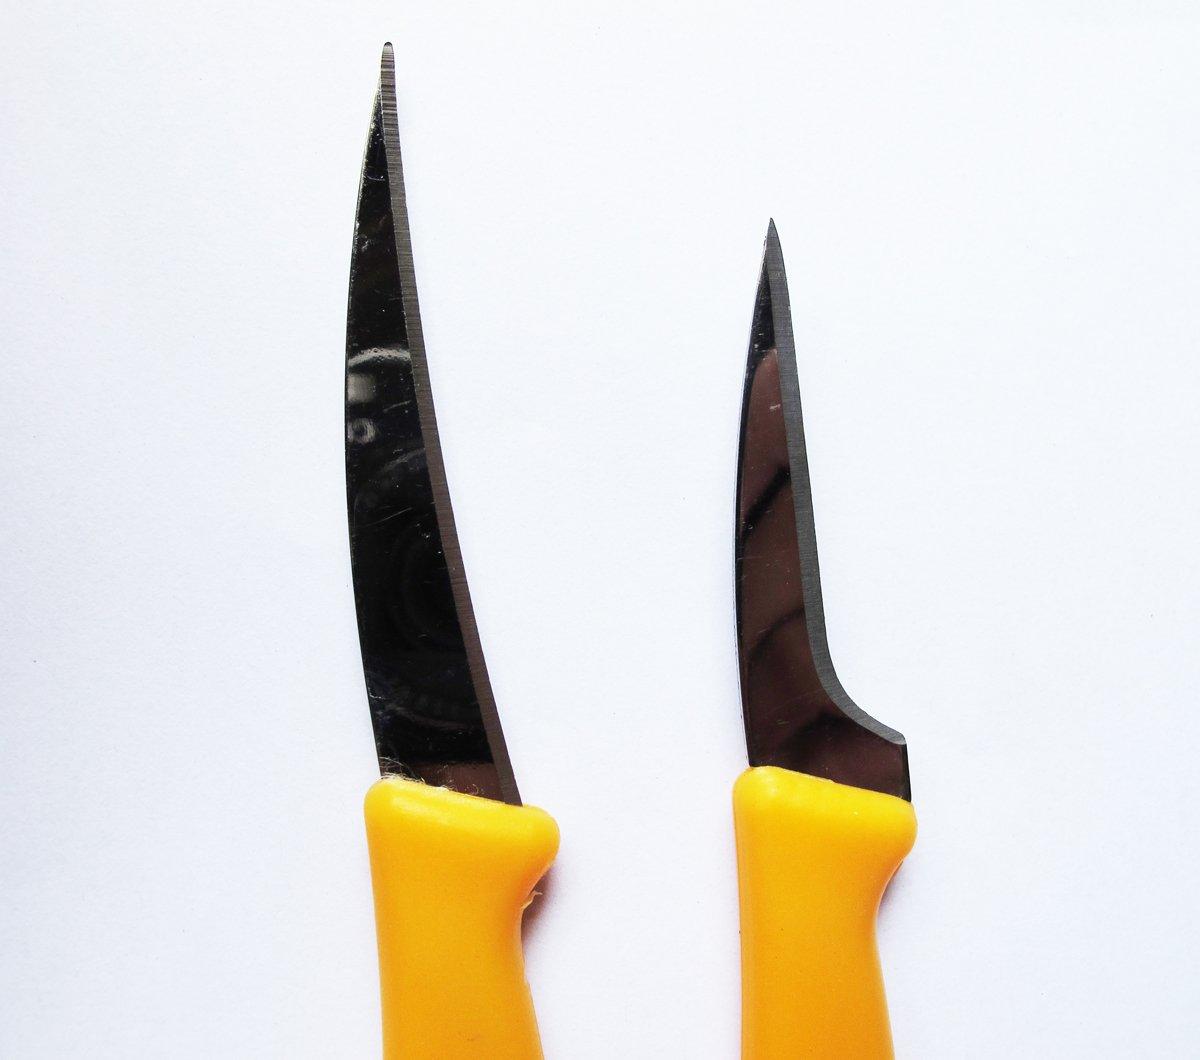 Set Fruit Carving Knife Plastic Handle Yellow.02.5 inch 2 Pcs. of Thailand by Jaguar (Image #2)